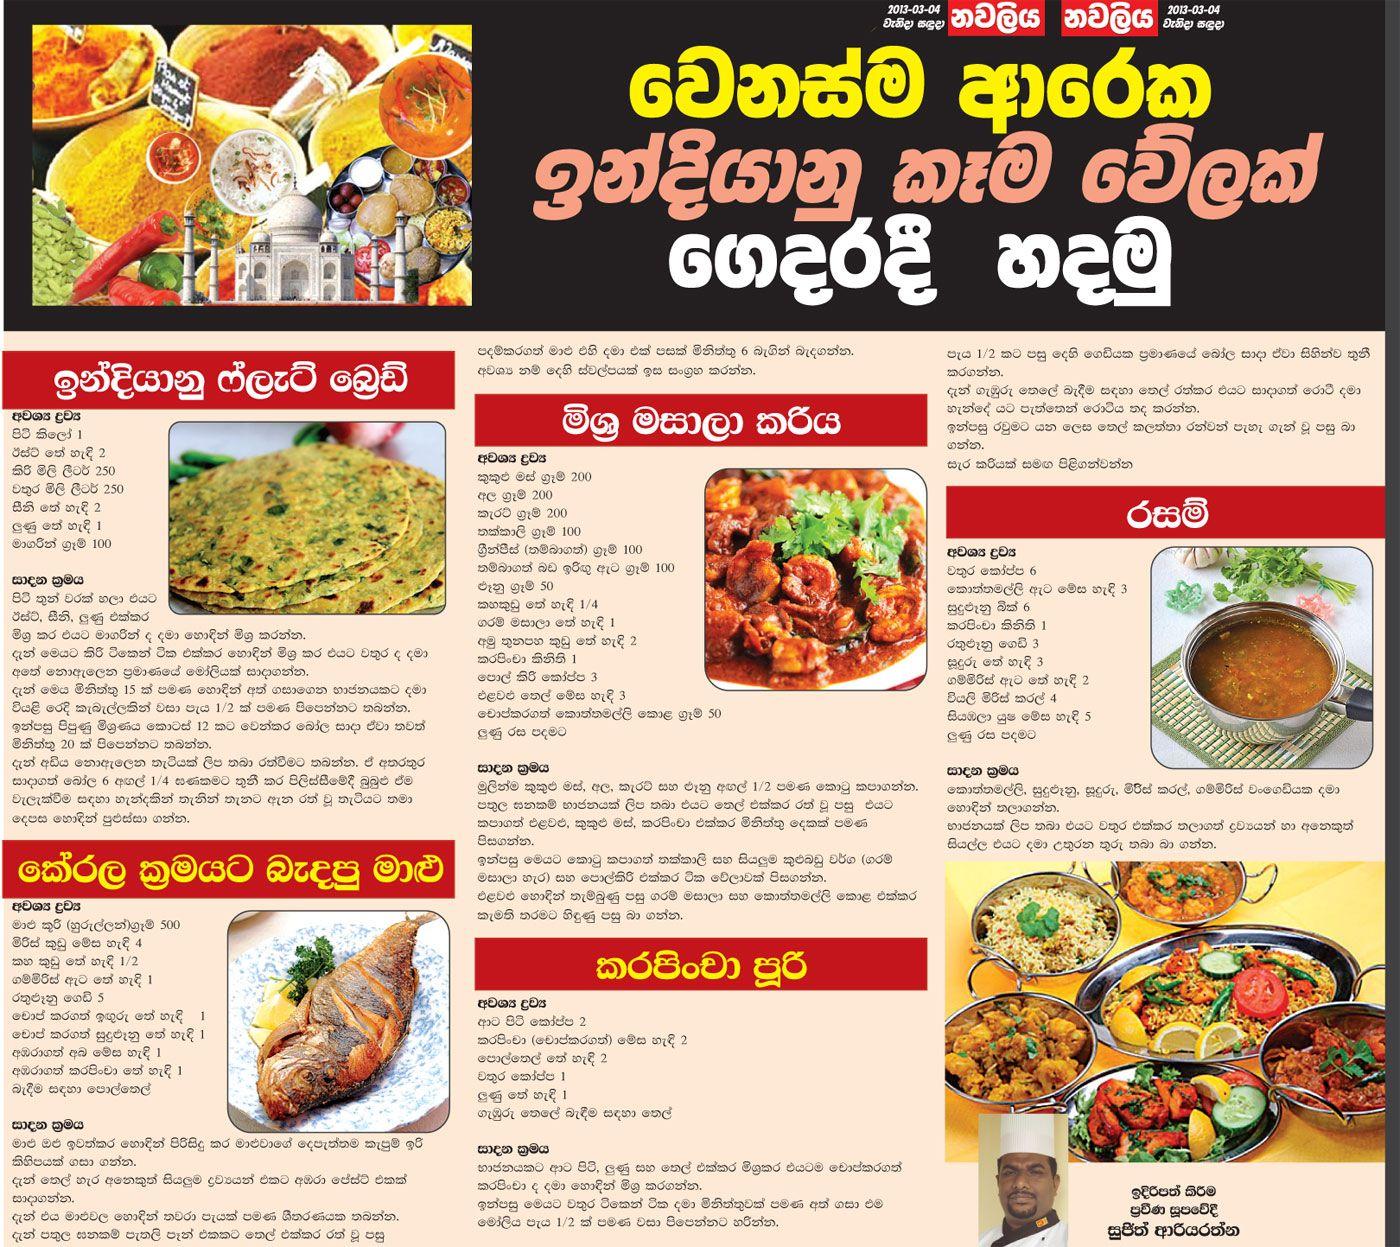 Sinhala sri lankan foods recipes taste the difference places to sinhala sri lankan foods recipes taste the difference forumfinder Gallery